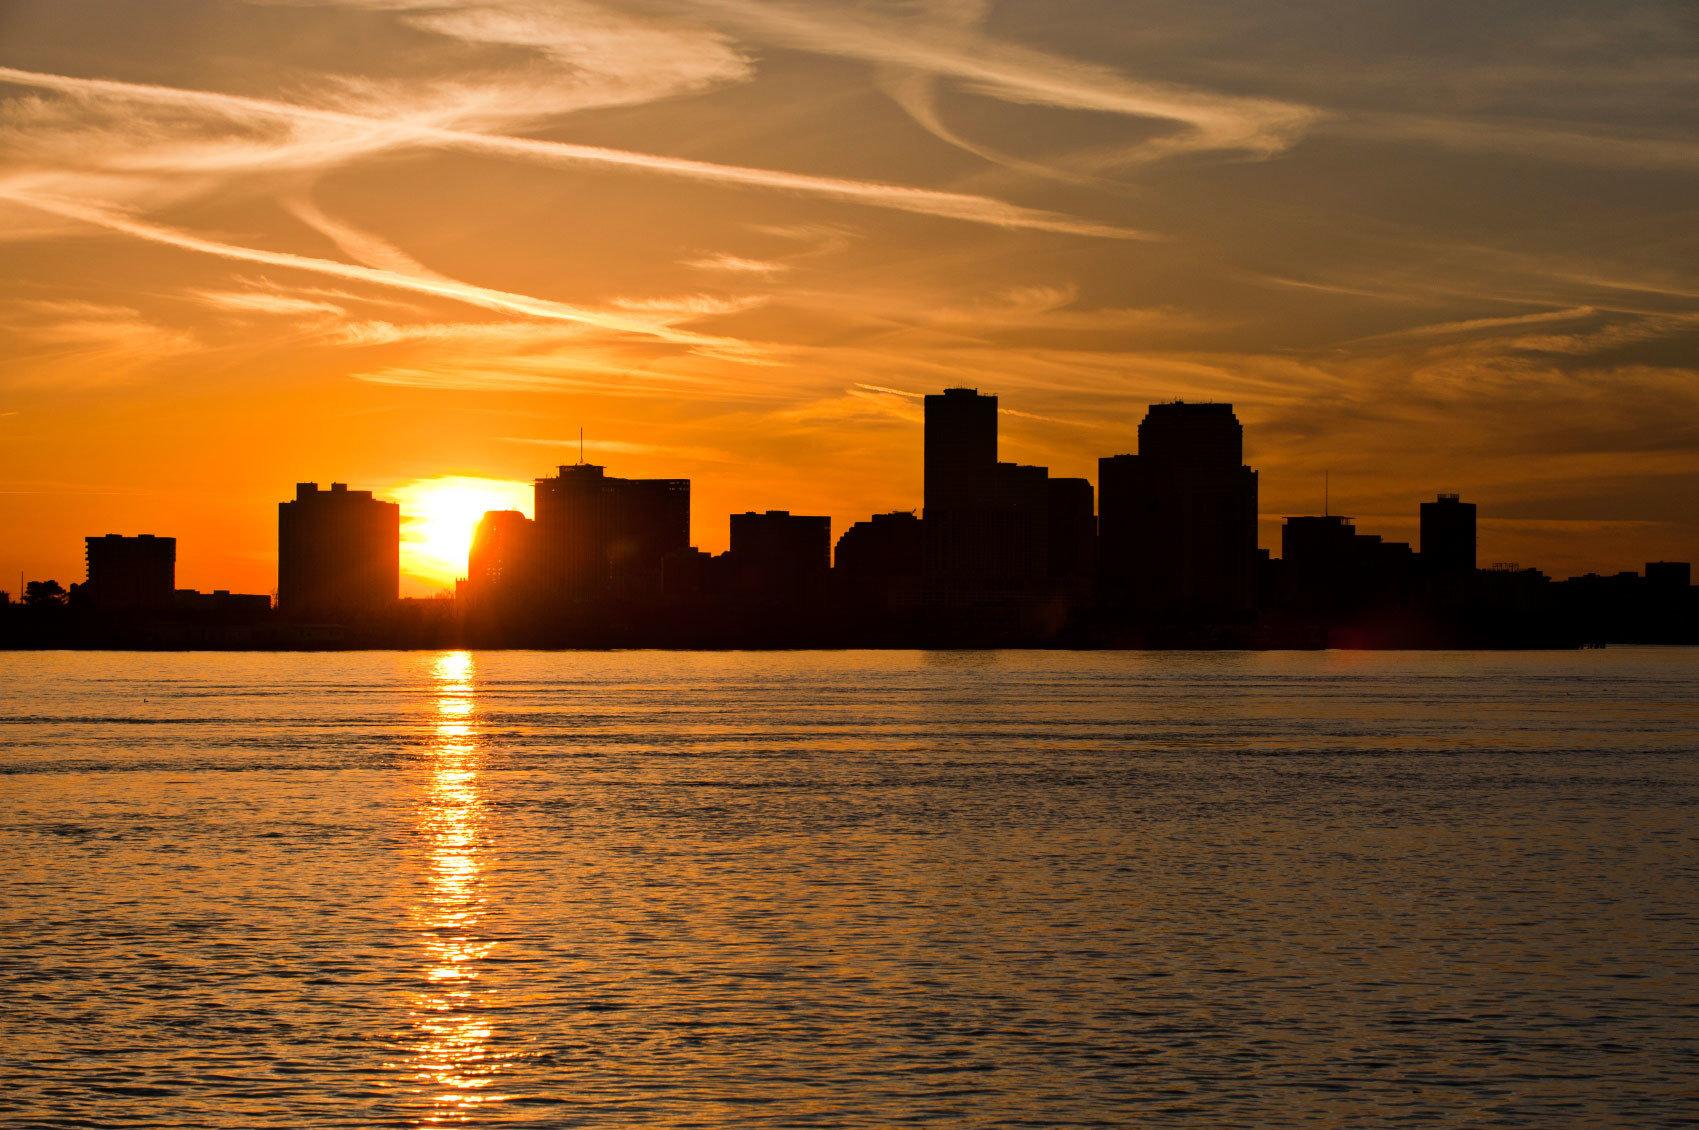 water sky Sunset skyline horizon afterglow sunrise dawn light City Sun dusk Sea morning cloud evening Ocean sunlight Coast cityscape setting distance